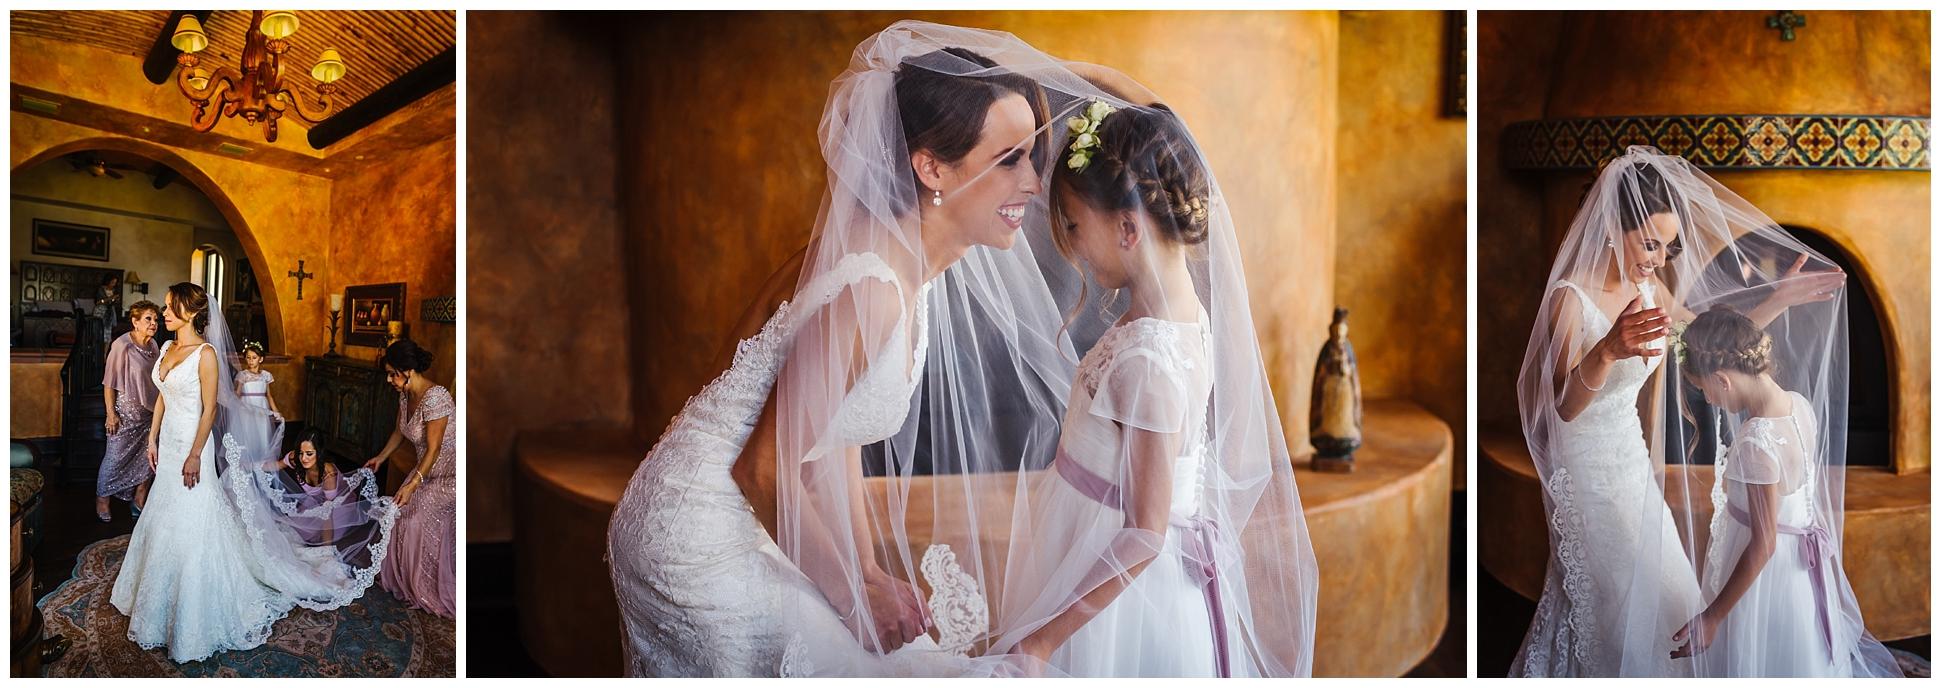 Tampa-luxury-wedding-photographer-mision-lago-private-estate_0011.jpg